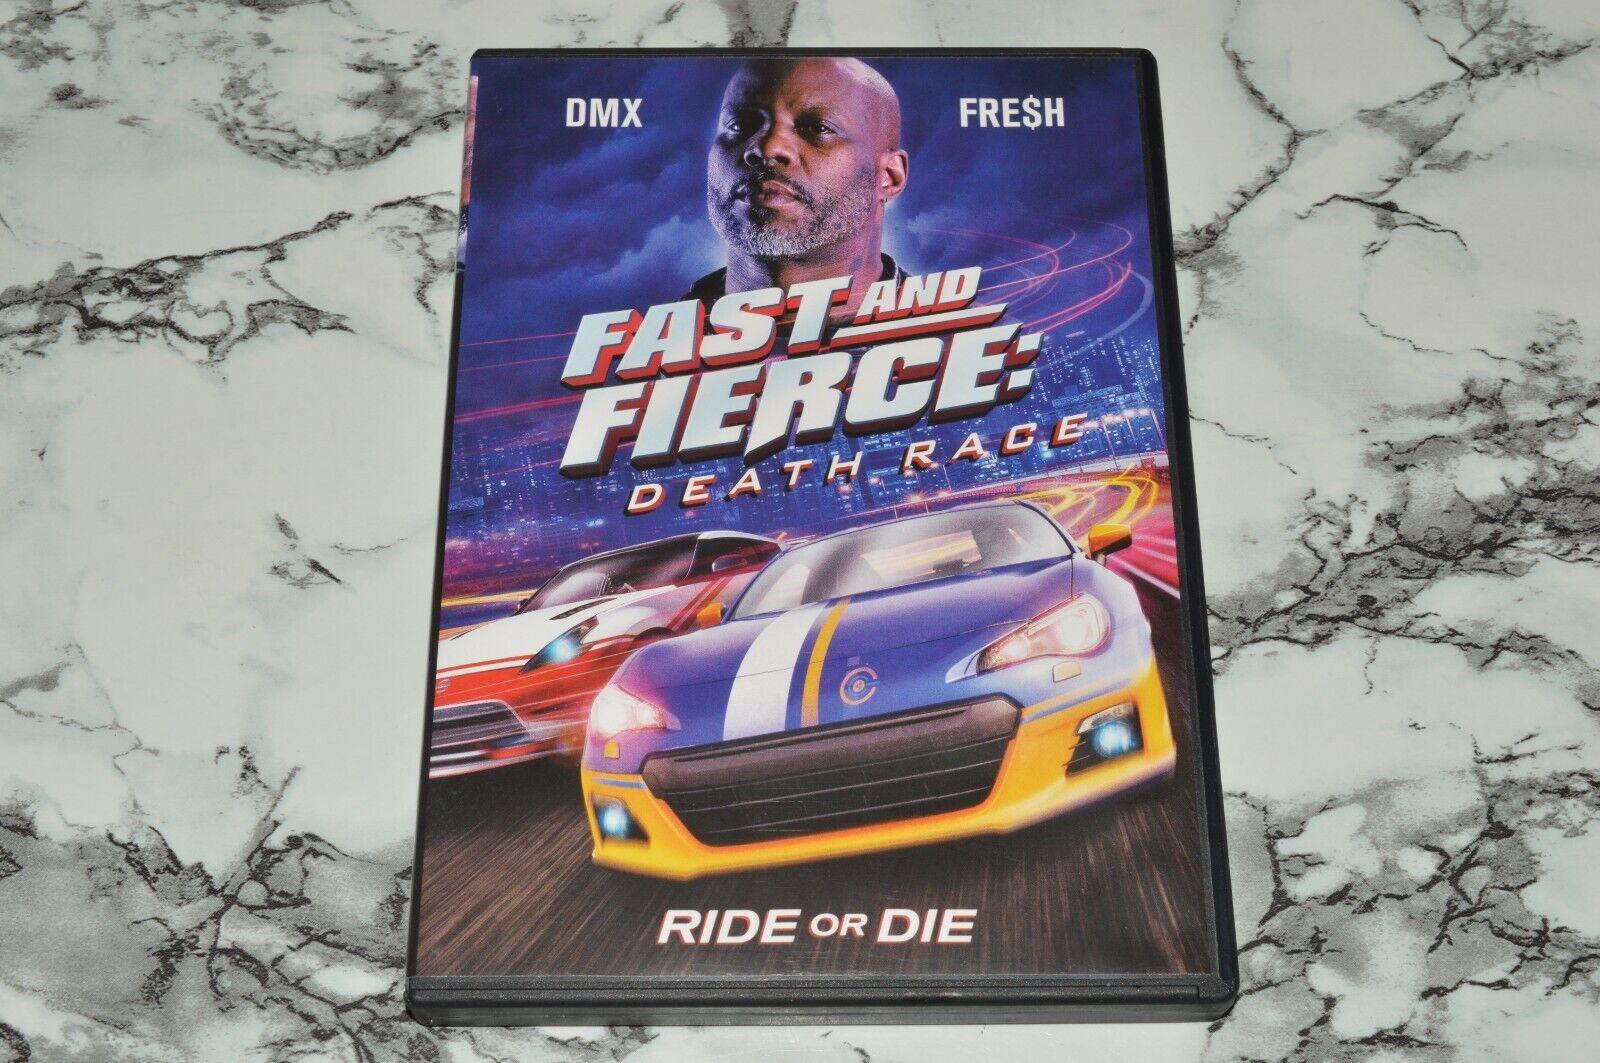 Fast And Fierce - Death Race DVD, 2020 -- DMX Fre h - $11.18